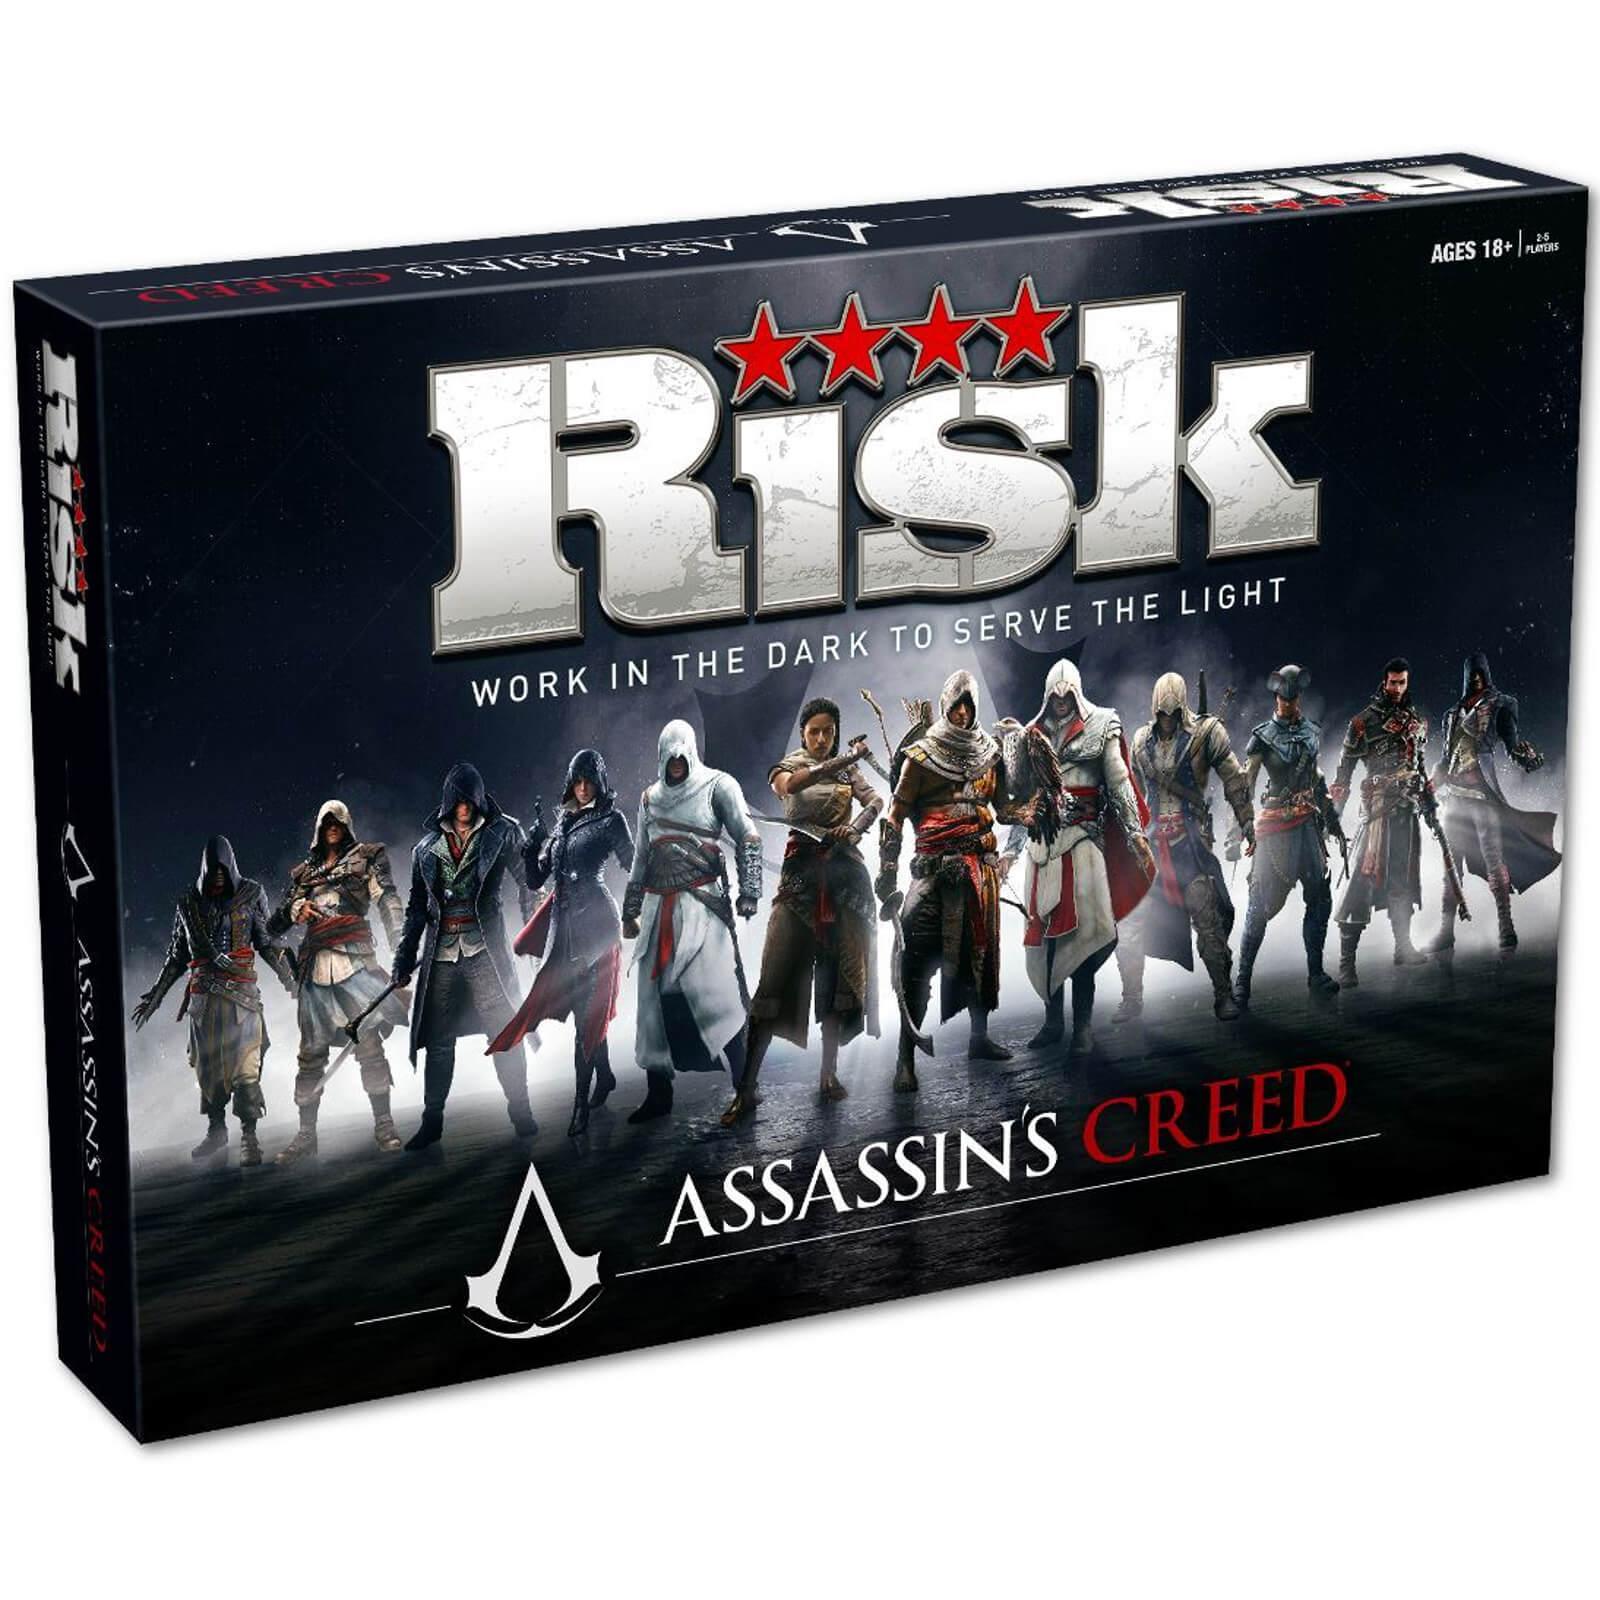 assassins creed movie full movie free